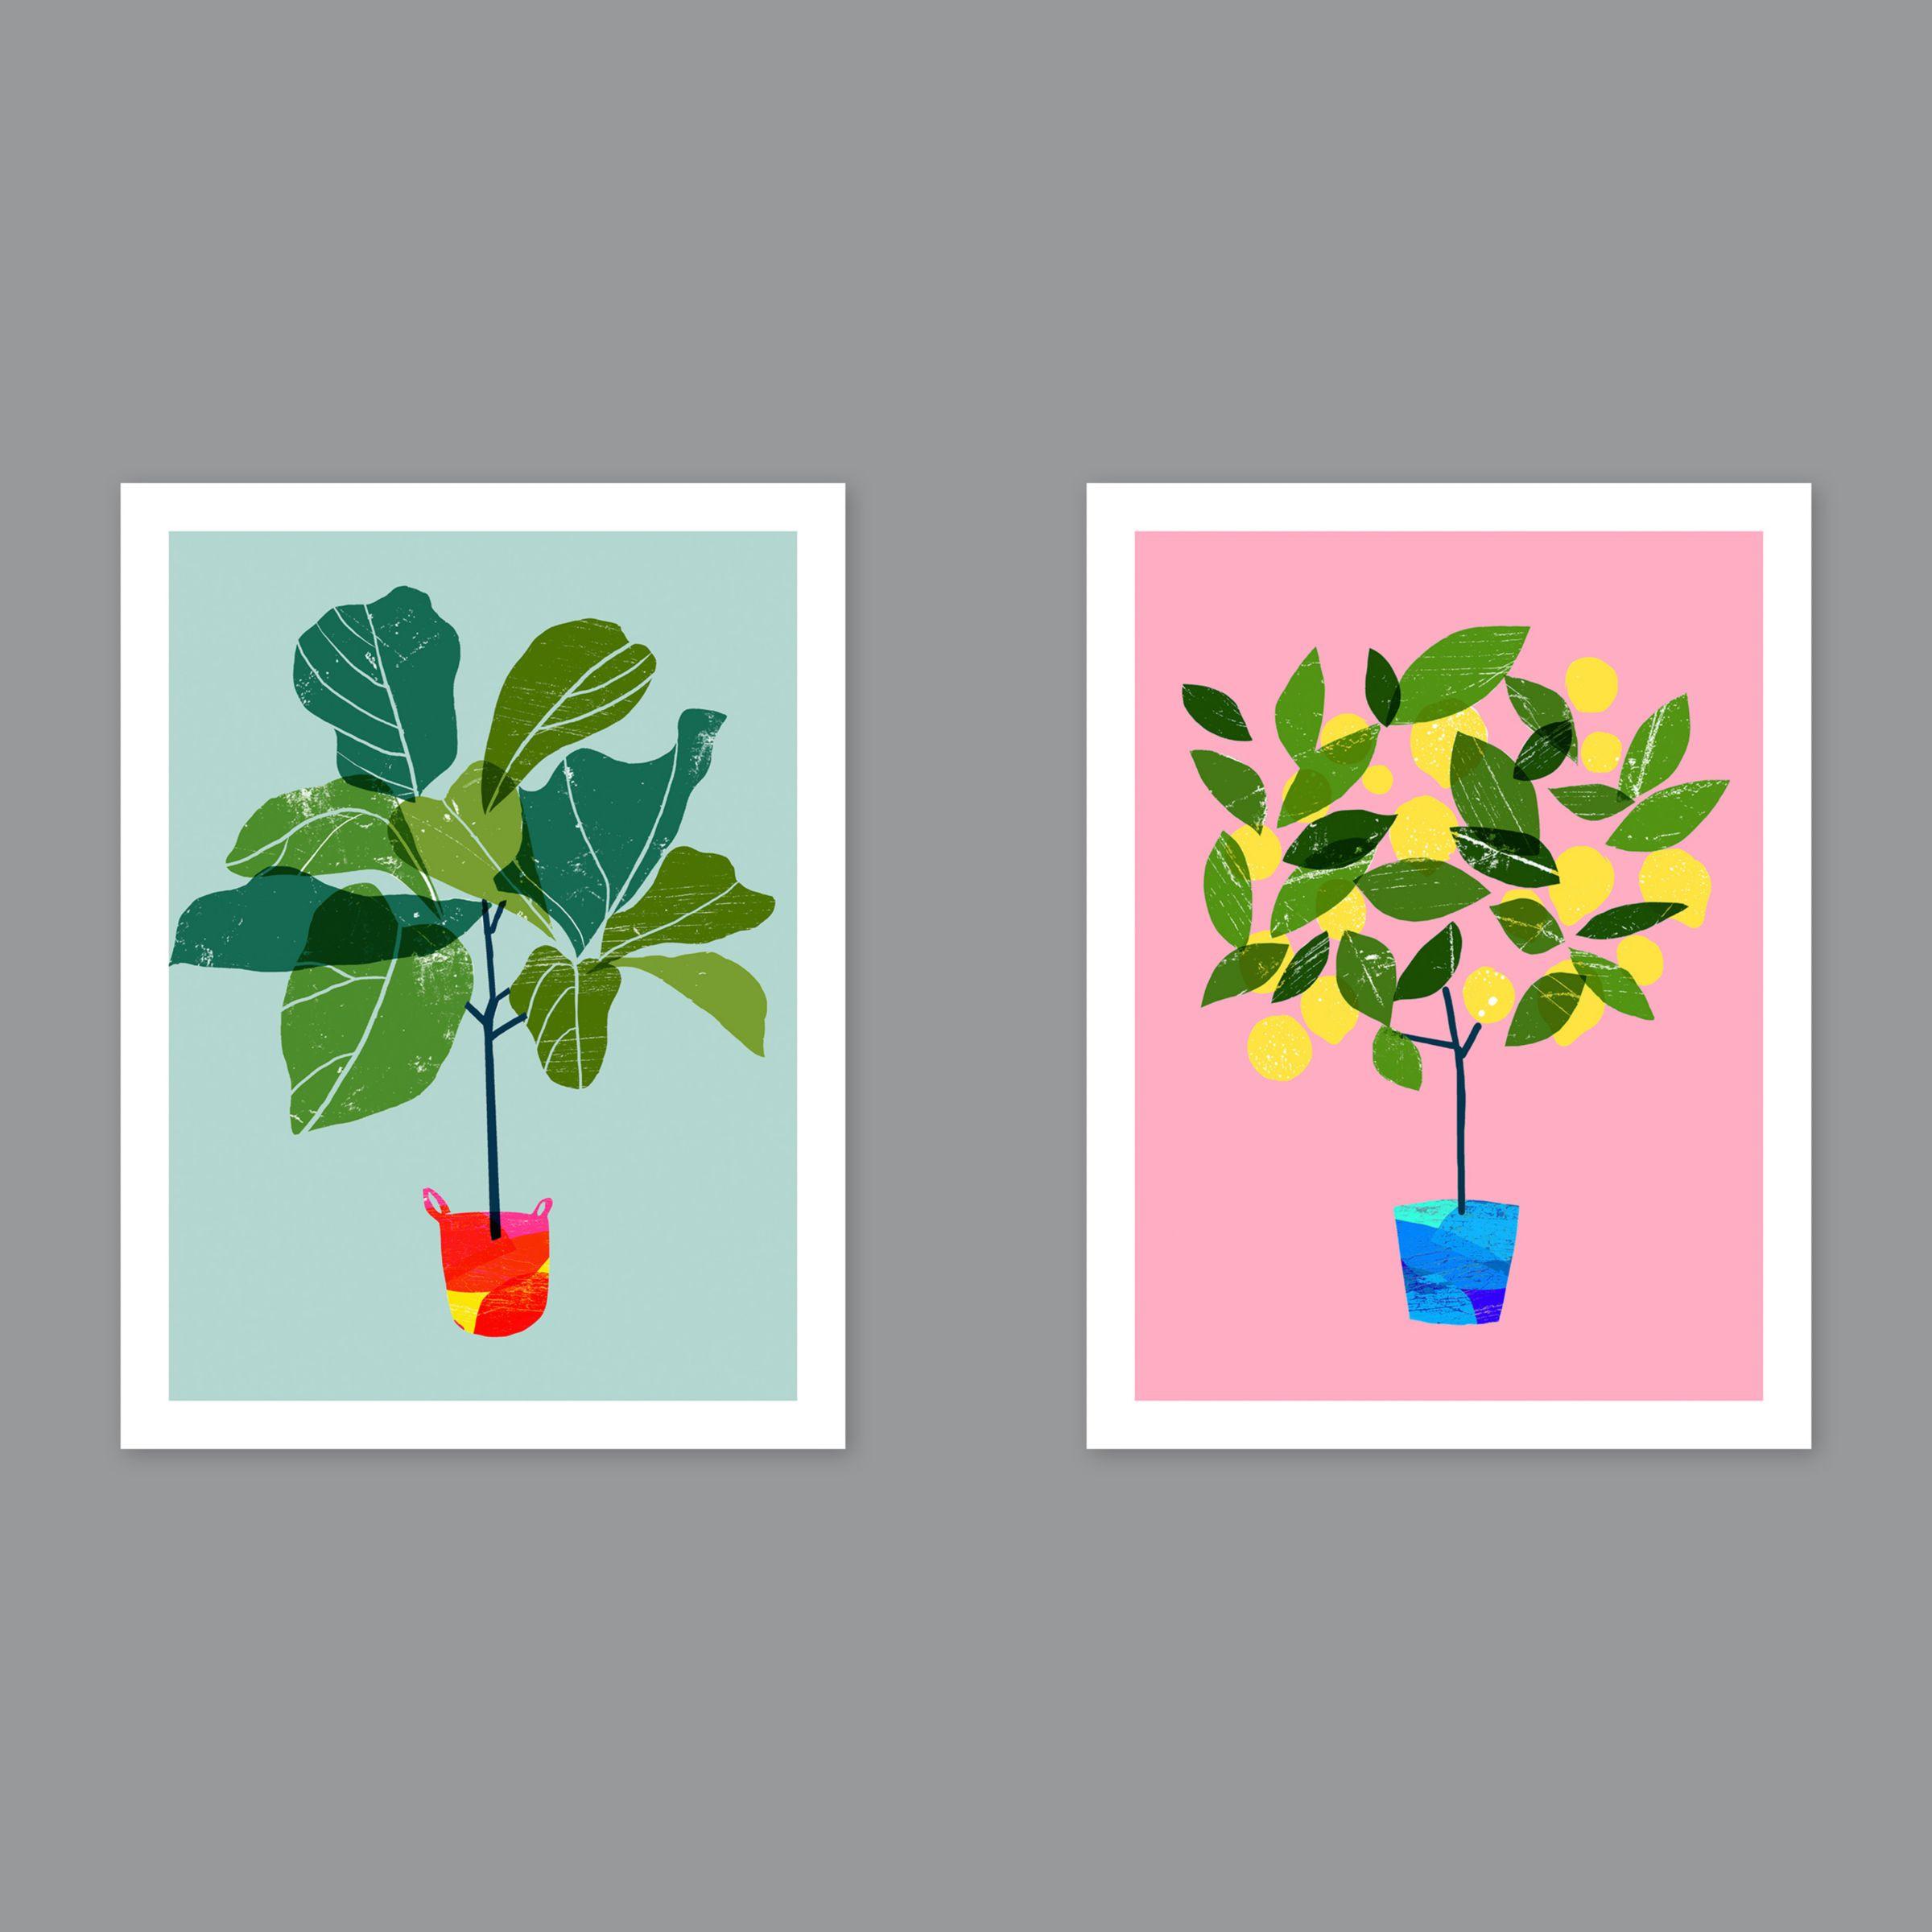 Unbranded Ana Zaja Petrak - Fig Tree / Lemon Tree Unframed Prints, Set of 2, 40 x 30cm